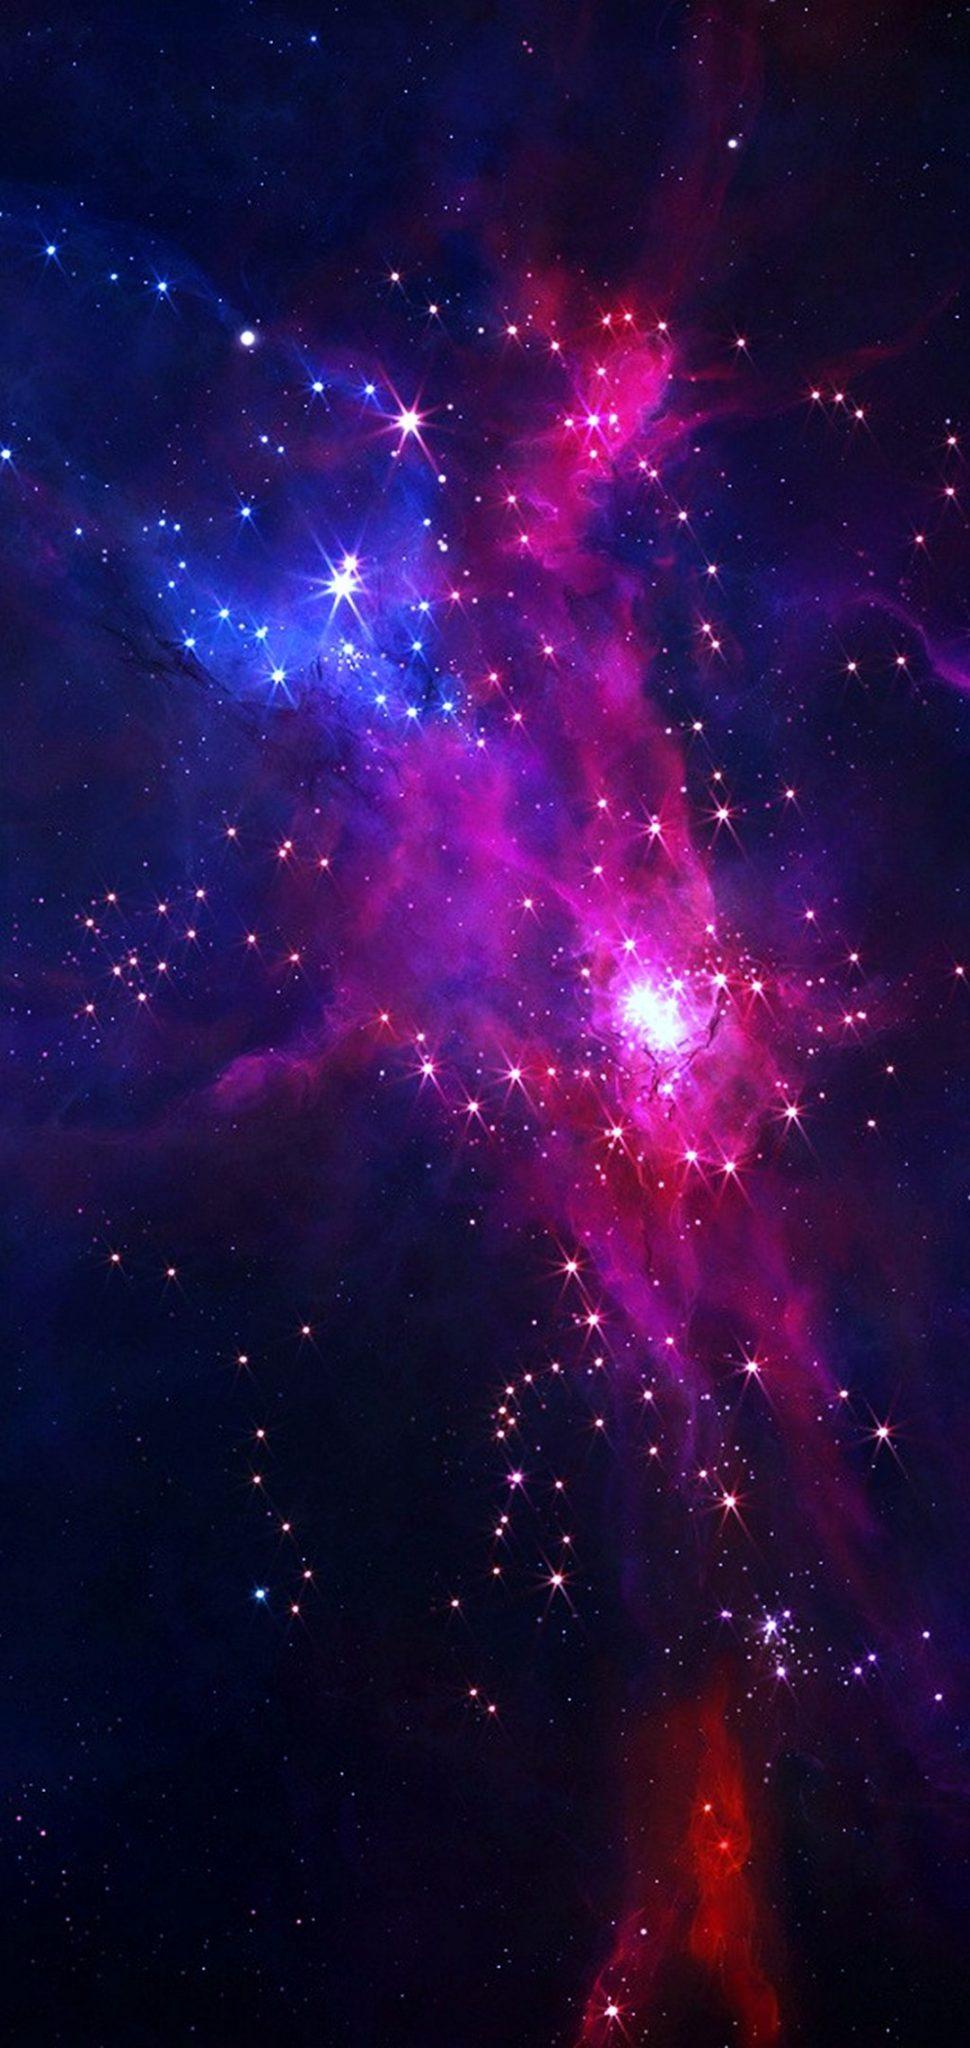 1080x2280 Beauty Colors Galaxy Wallpaper Galaxy Beauty Colors Wallpaper 1080x2280 Hd Wallpaper In 2020 Colorful Wallpaper Galaxy Colors Galaxy Wallpaper